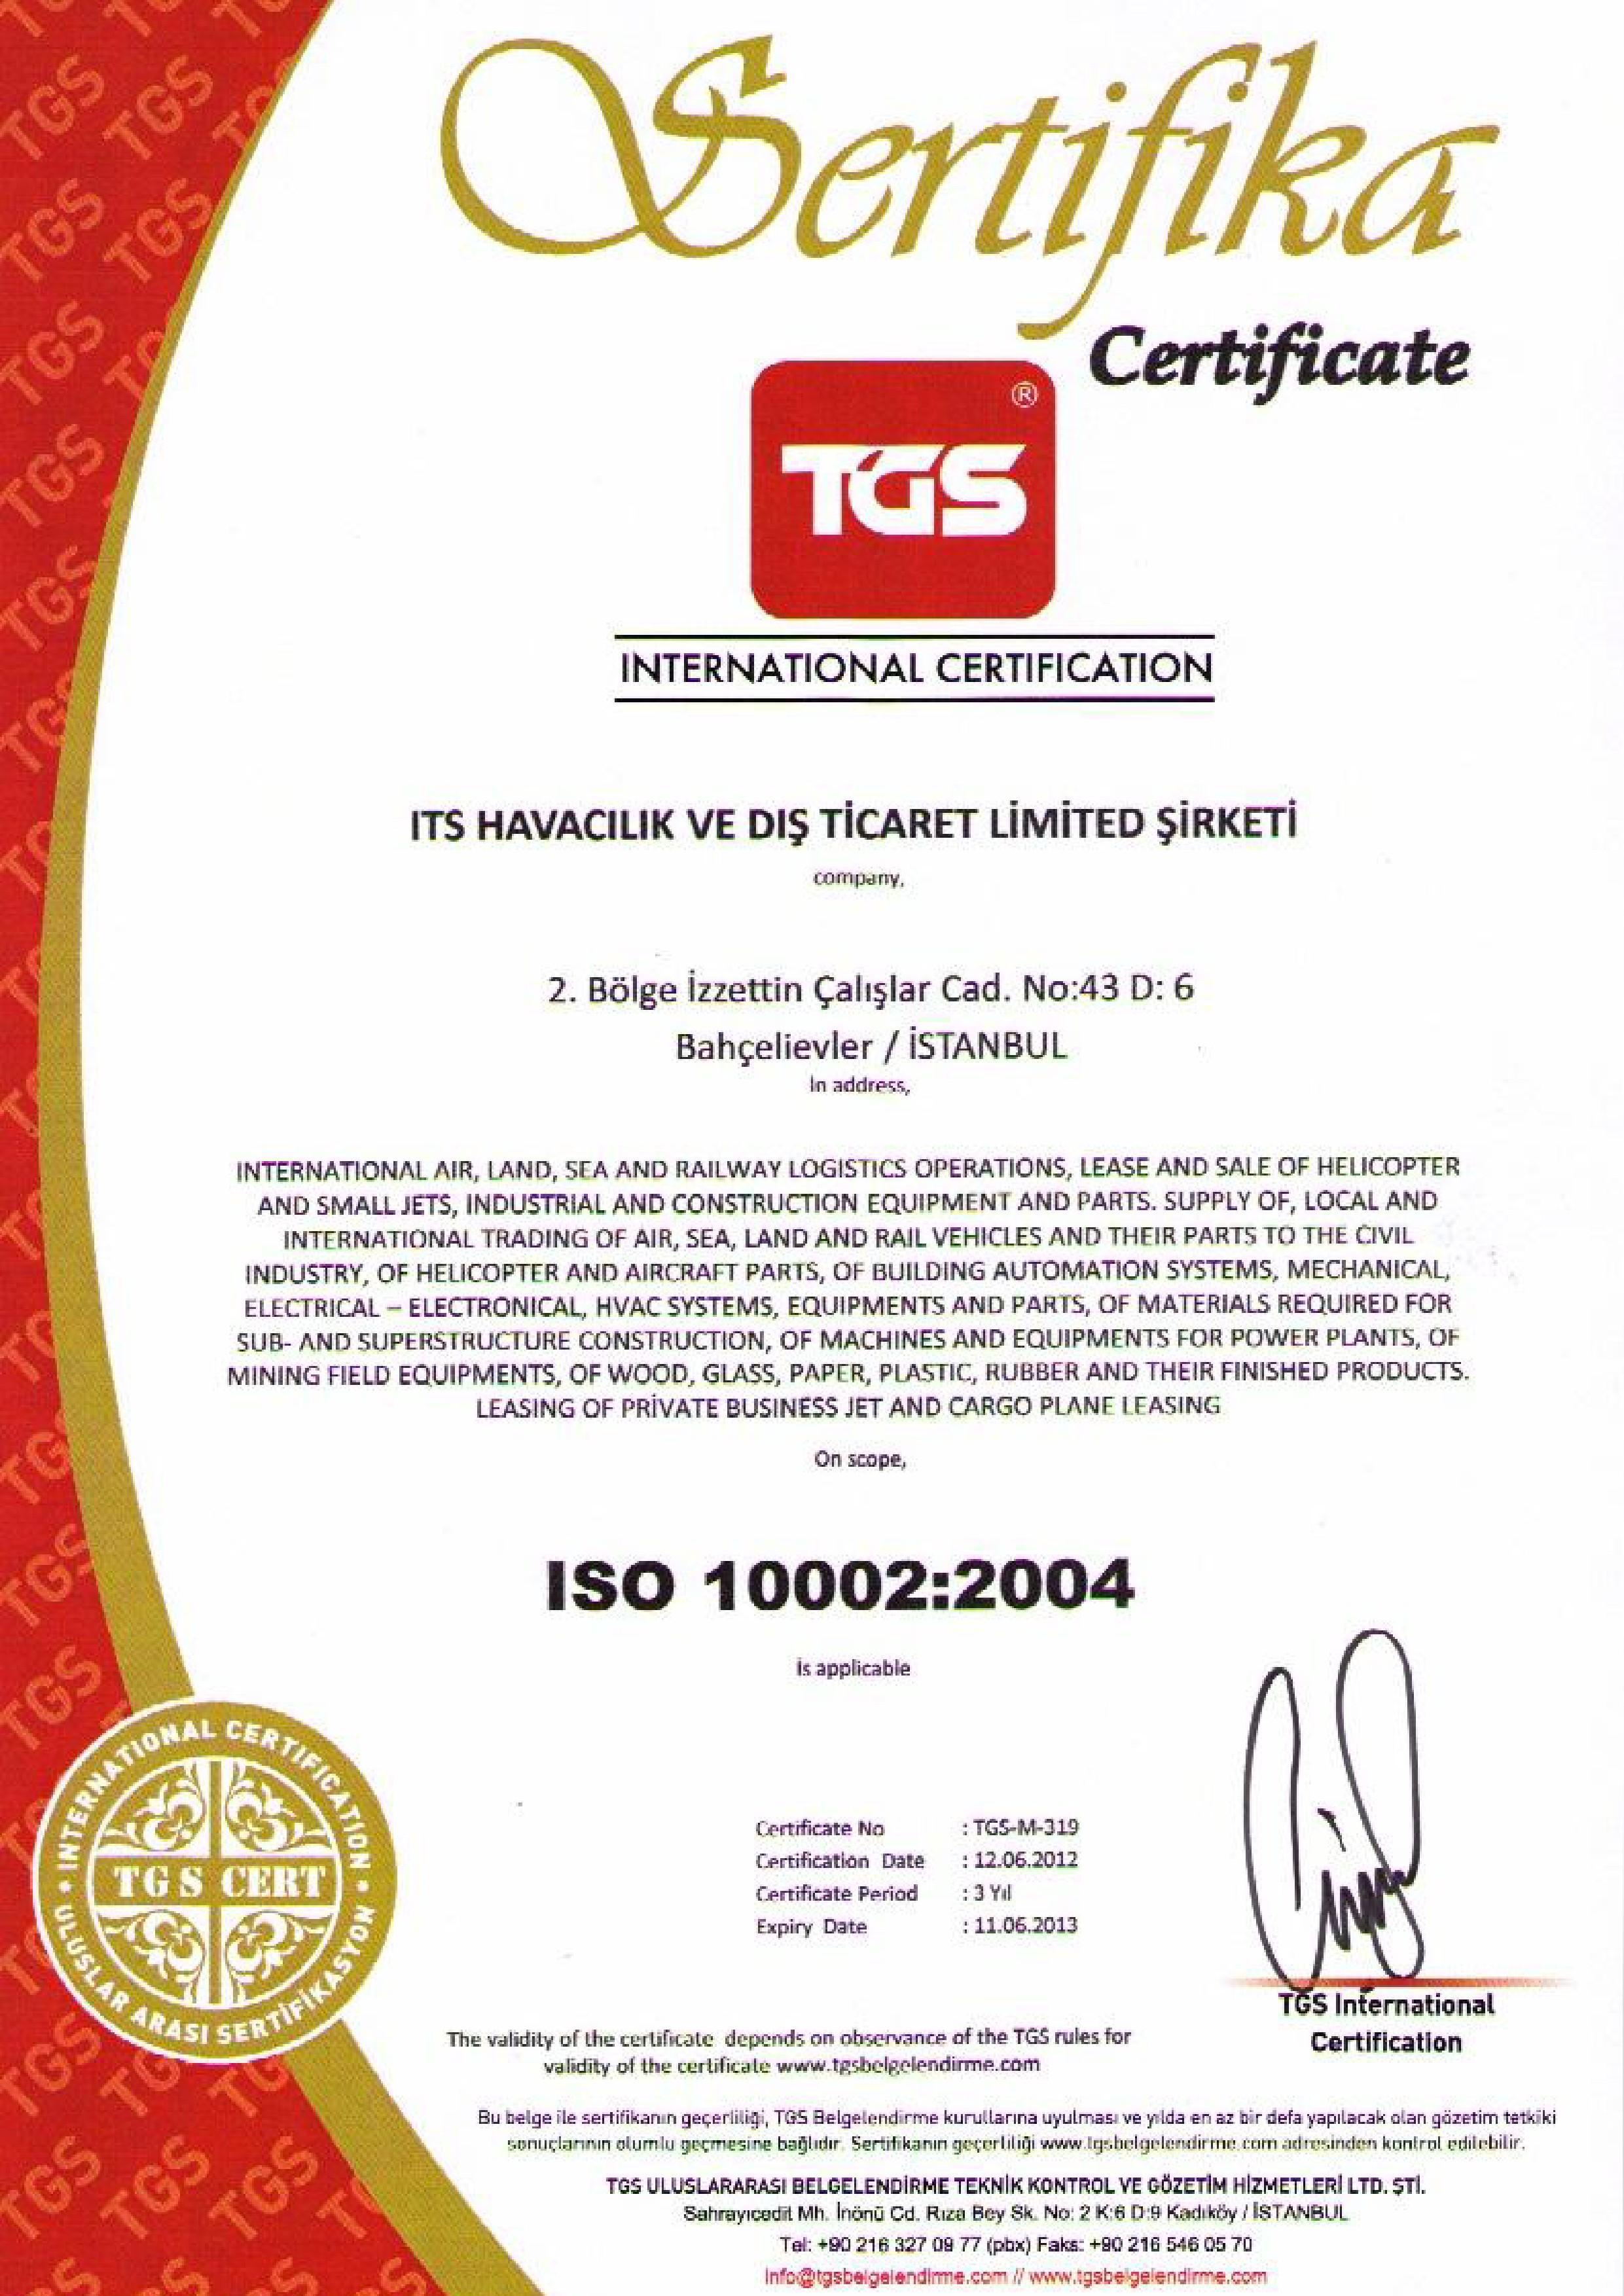 iso 10002 standard pdf free download